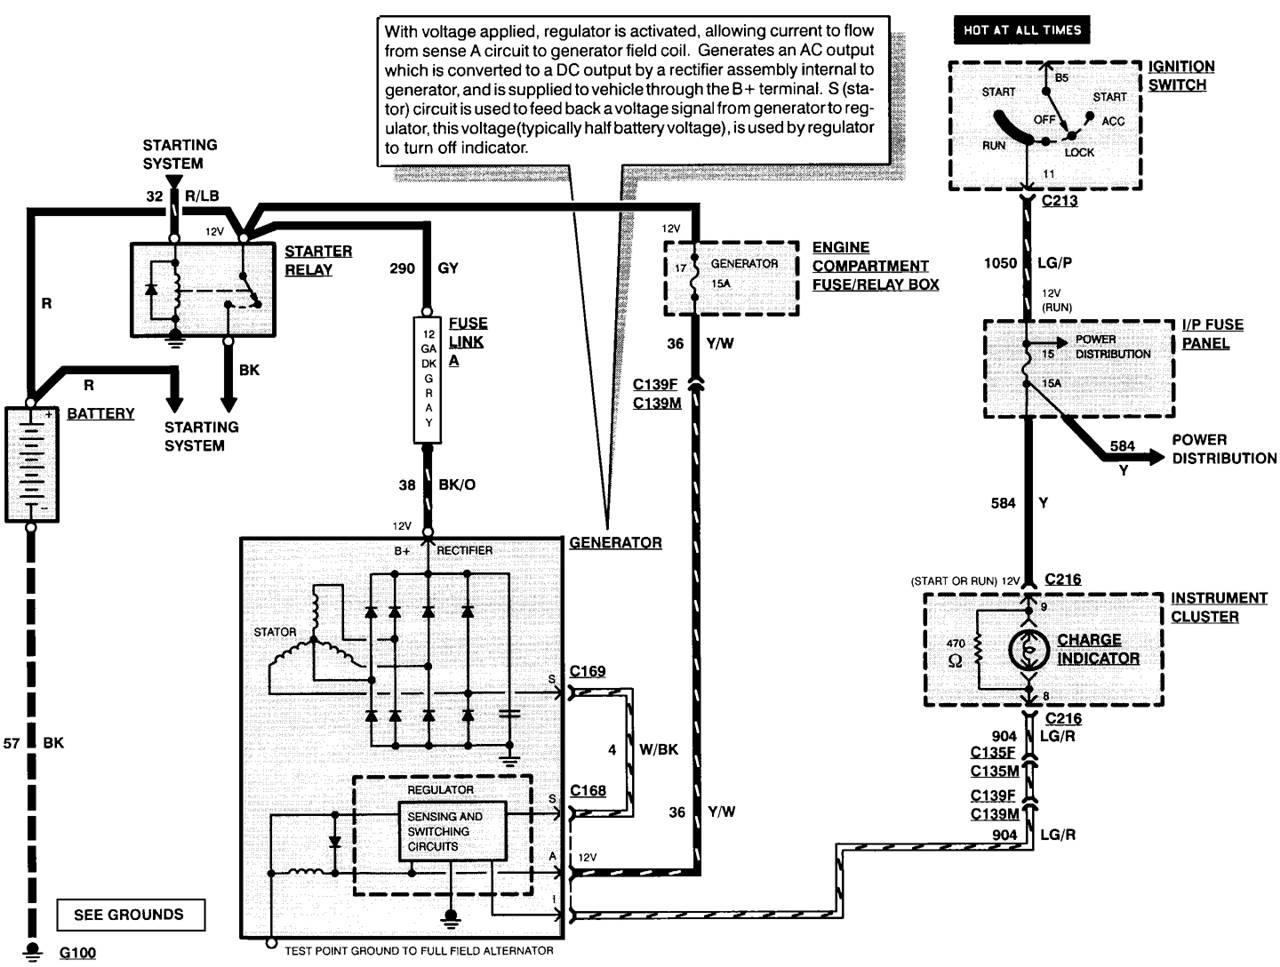 1985 chevy alternator wiring 85 chevy alternator wiring wiring diagram data  85 chevy alternator wiring wiring